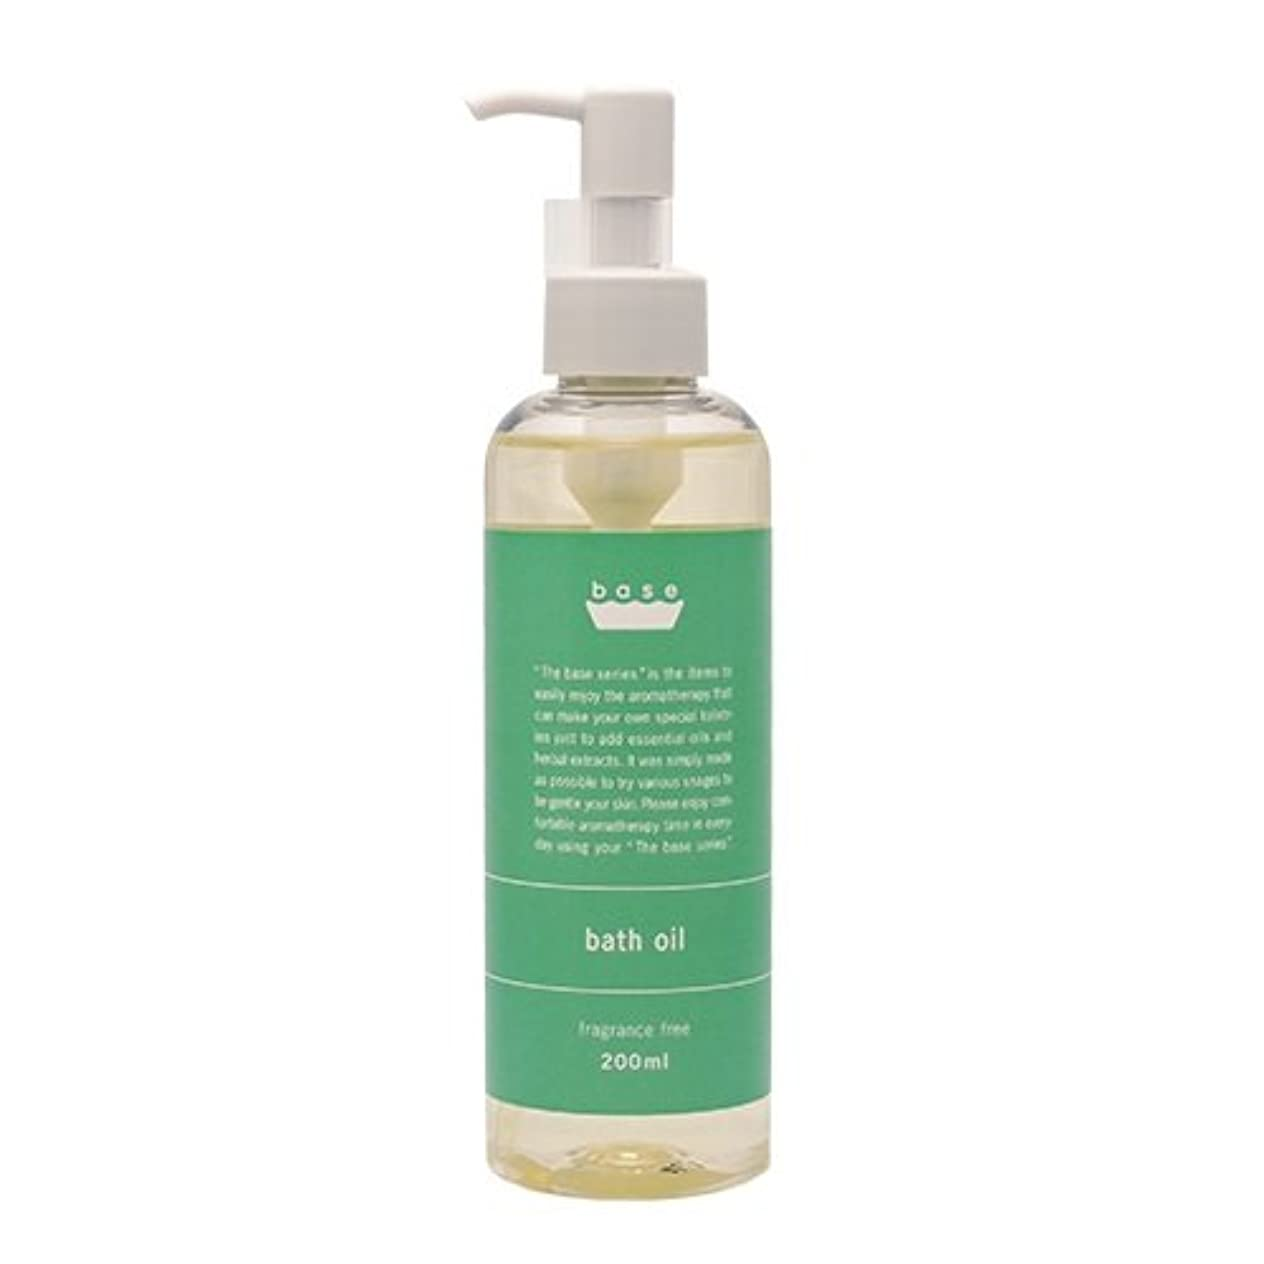 base bath oil(バスオイル)200ml